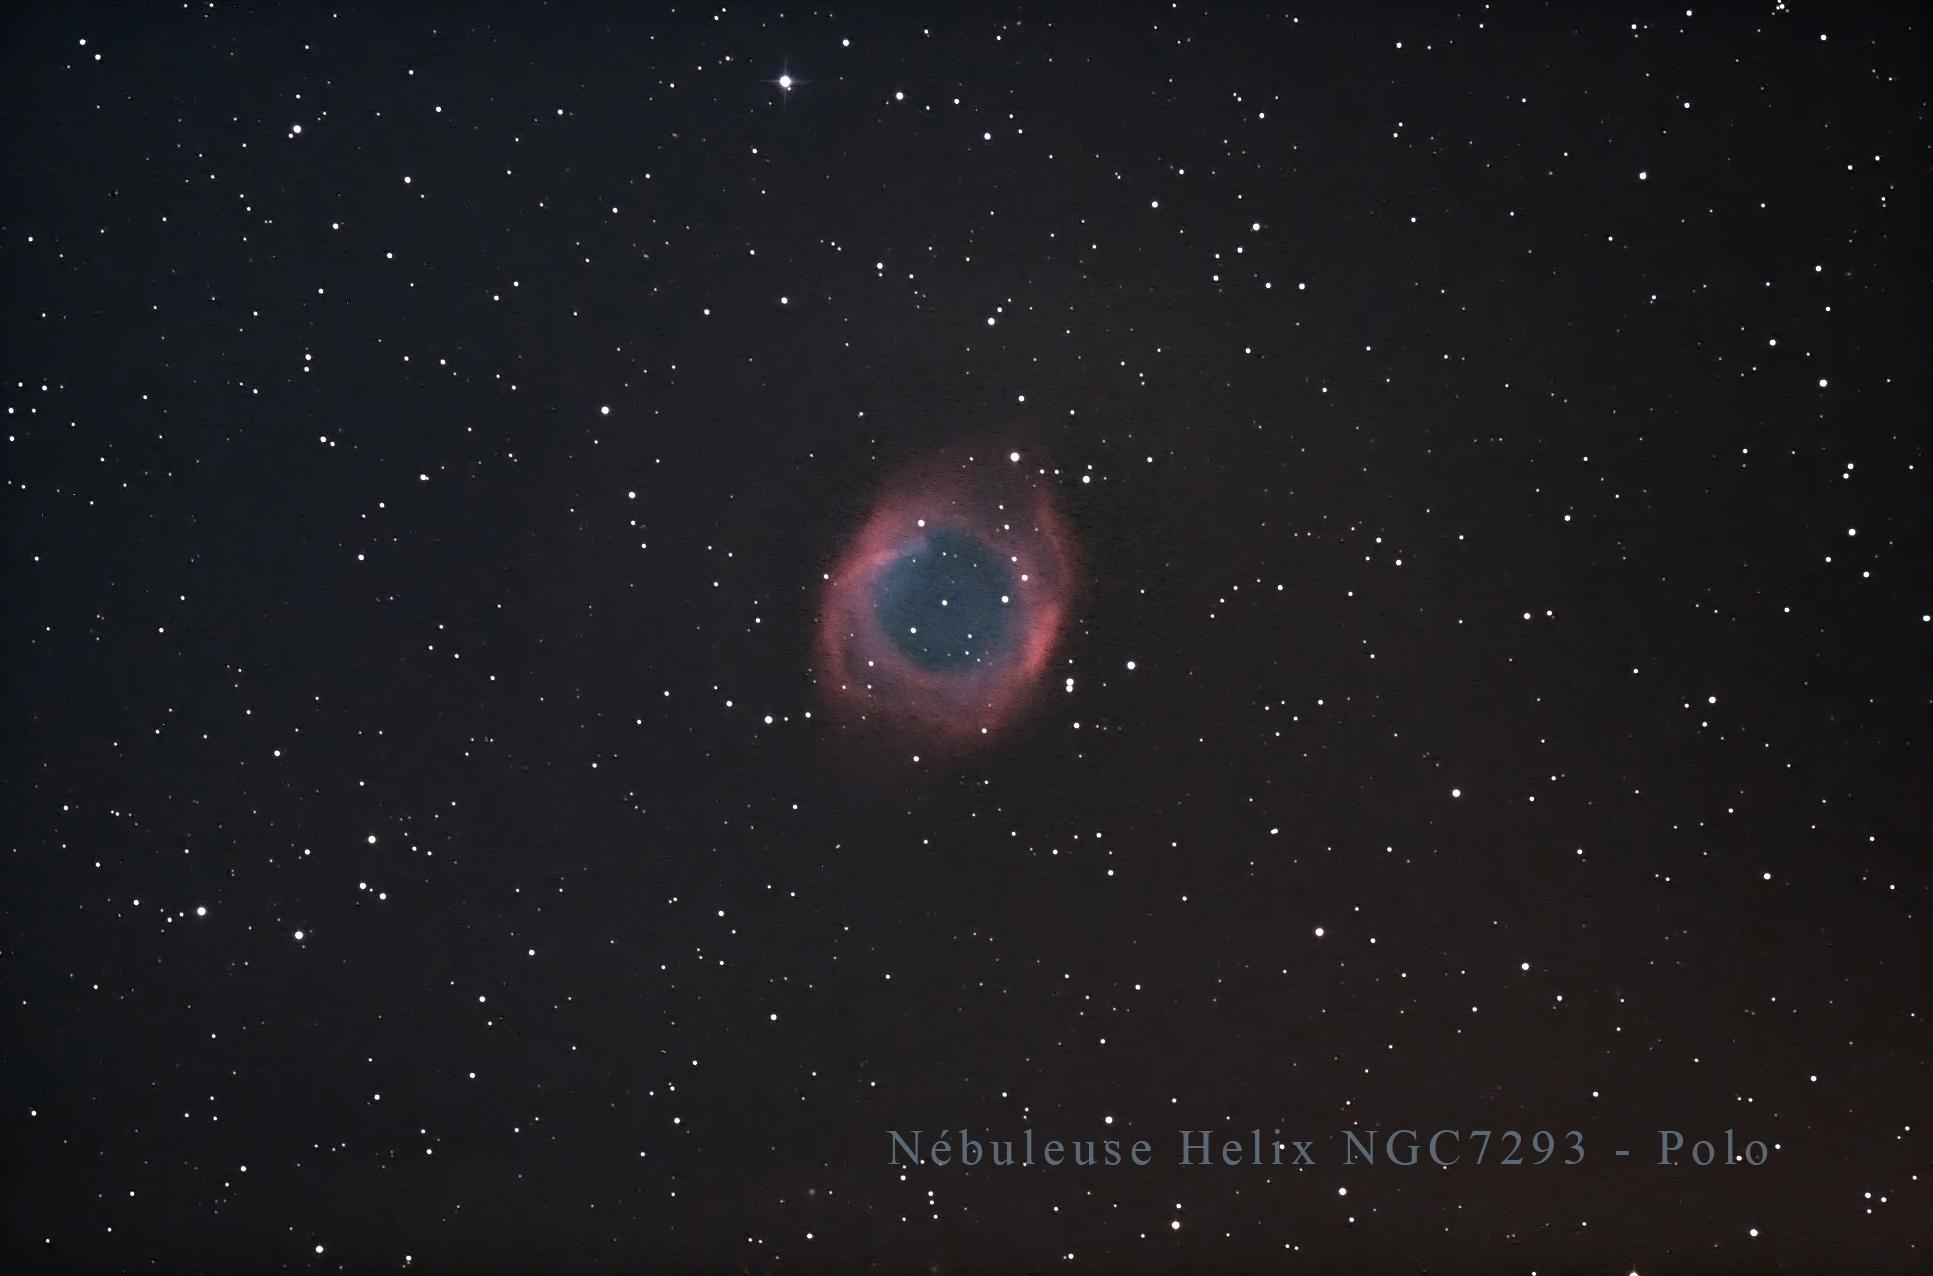 NGC 7293 Helix par polo.jpg